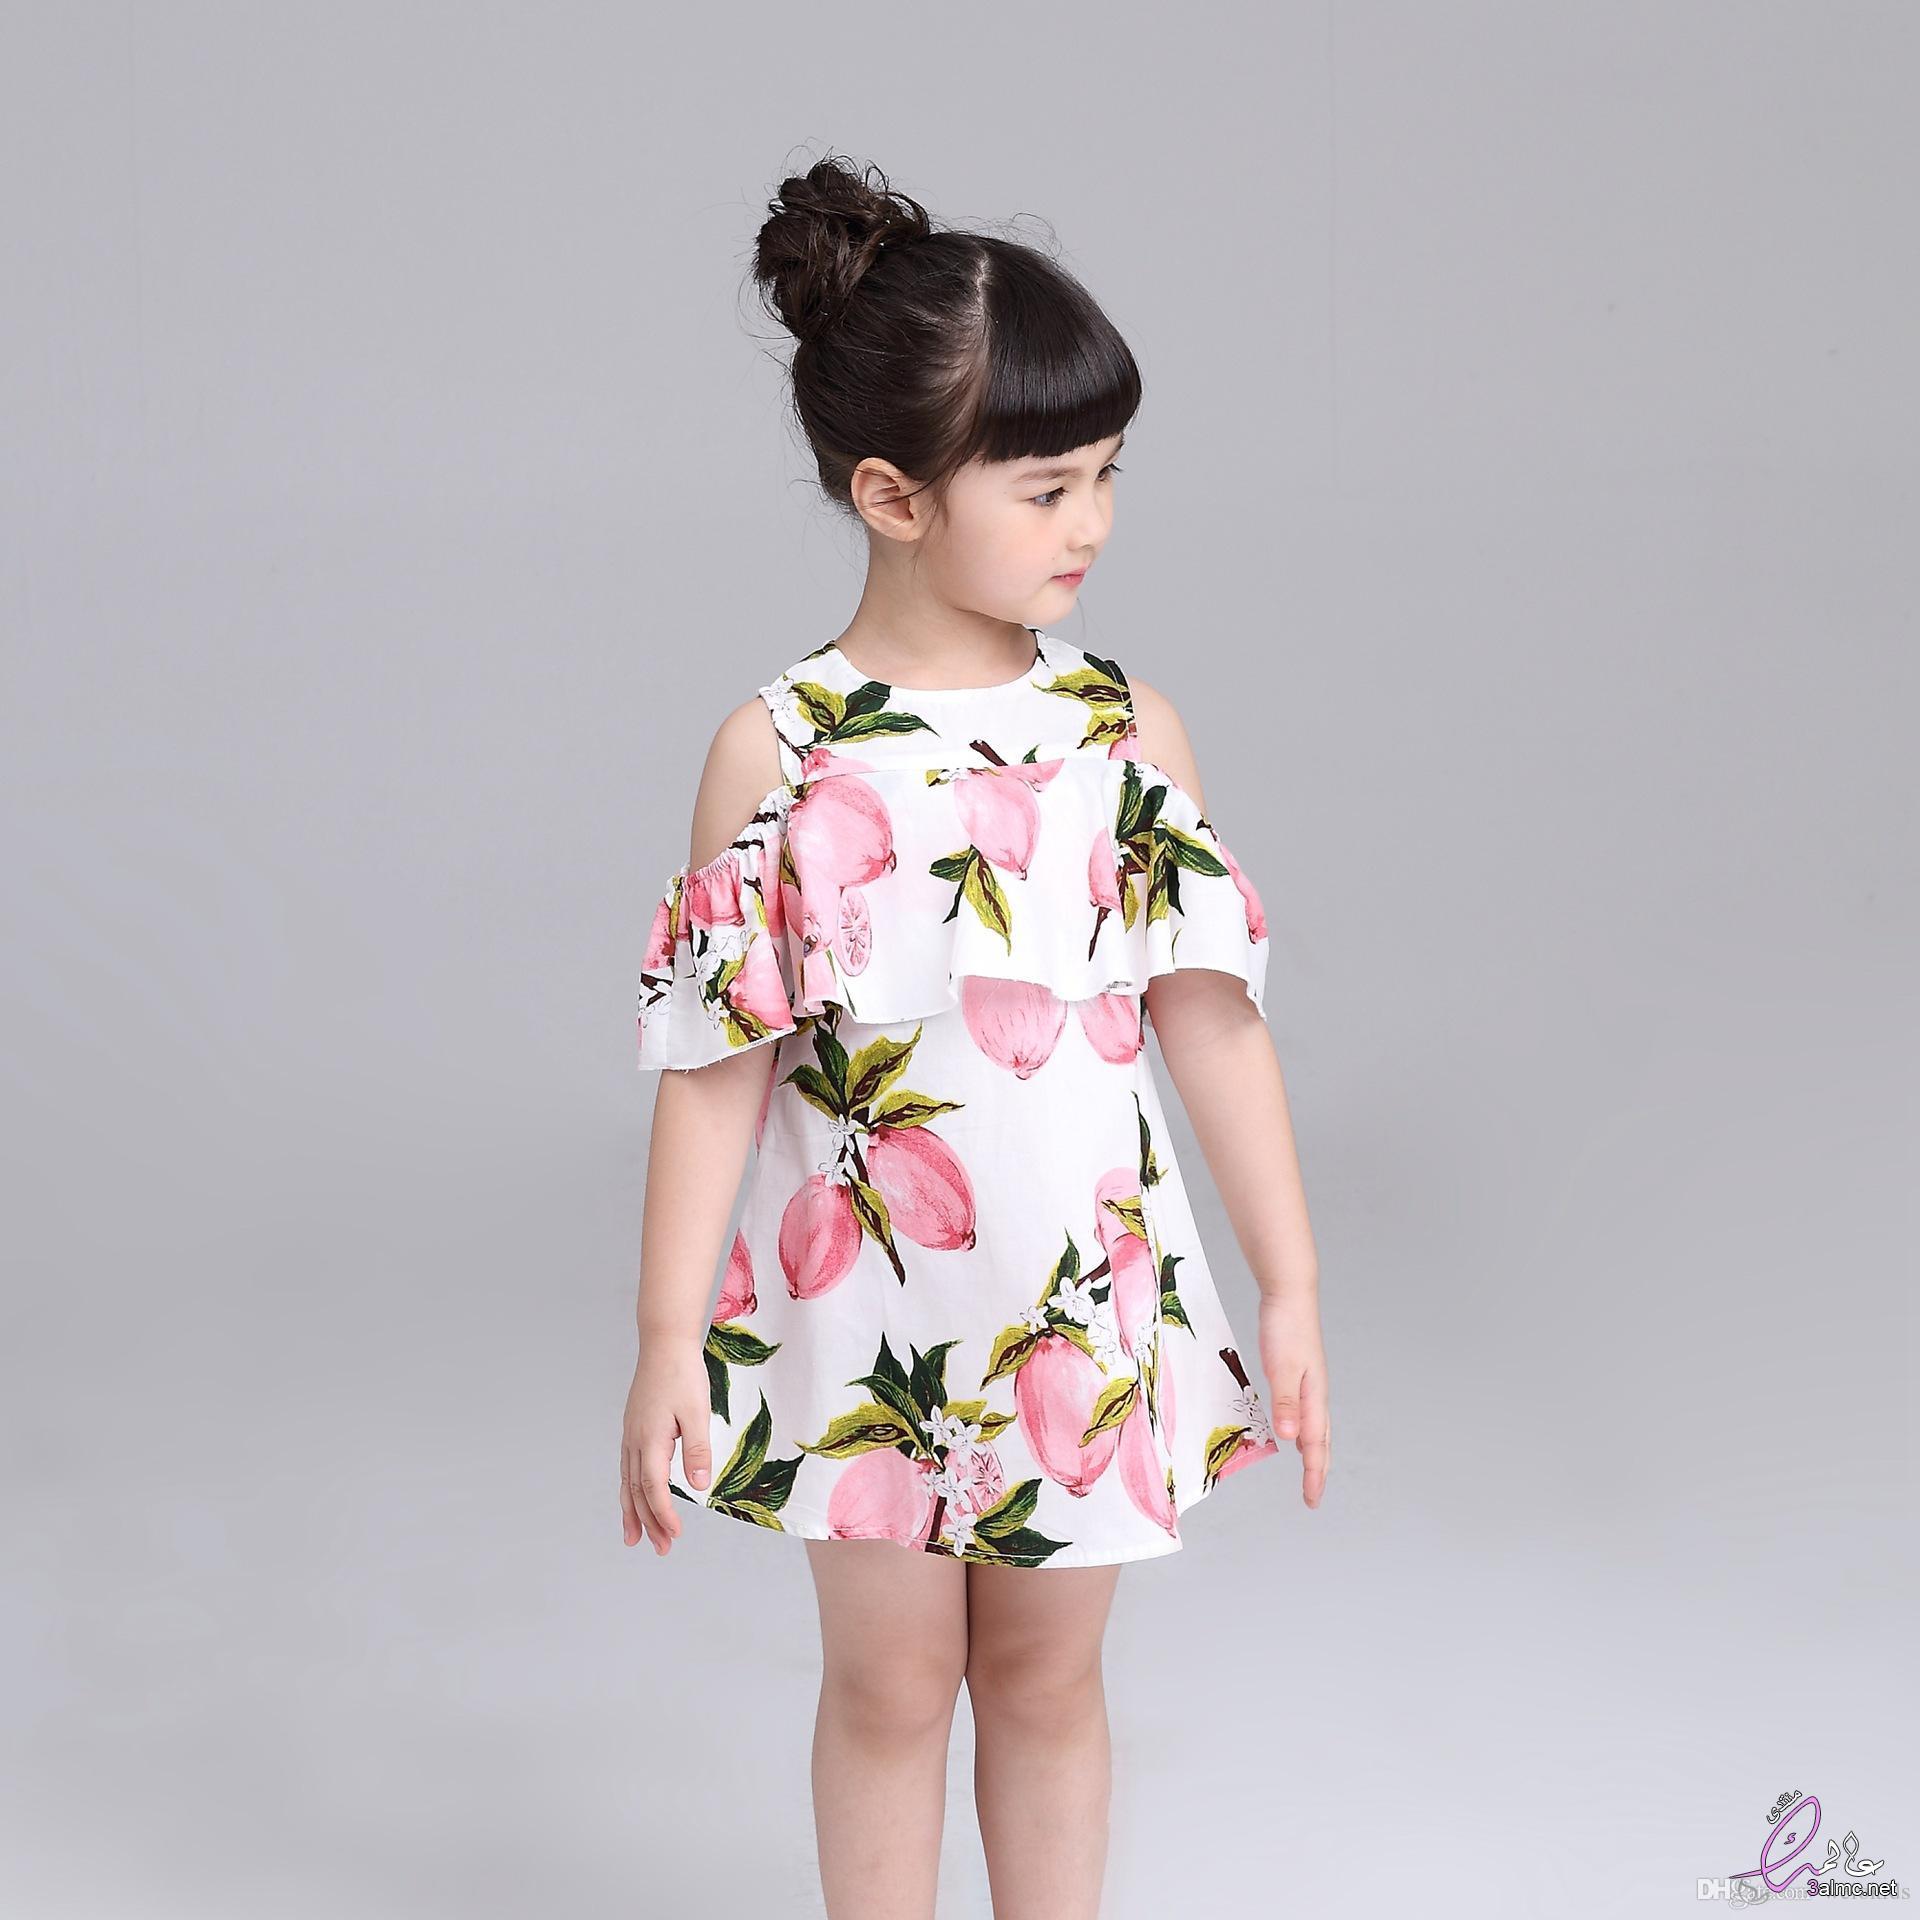 62450b9fd فساتين اطفال روعه.ملابس اطفال لصيف 2018.ازياء اطفال اكثر جاذبية.فساتين قماش